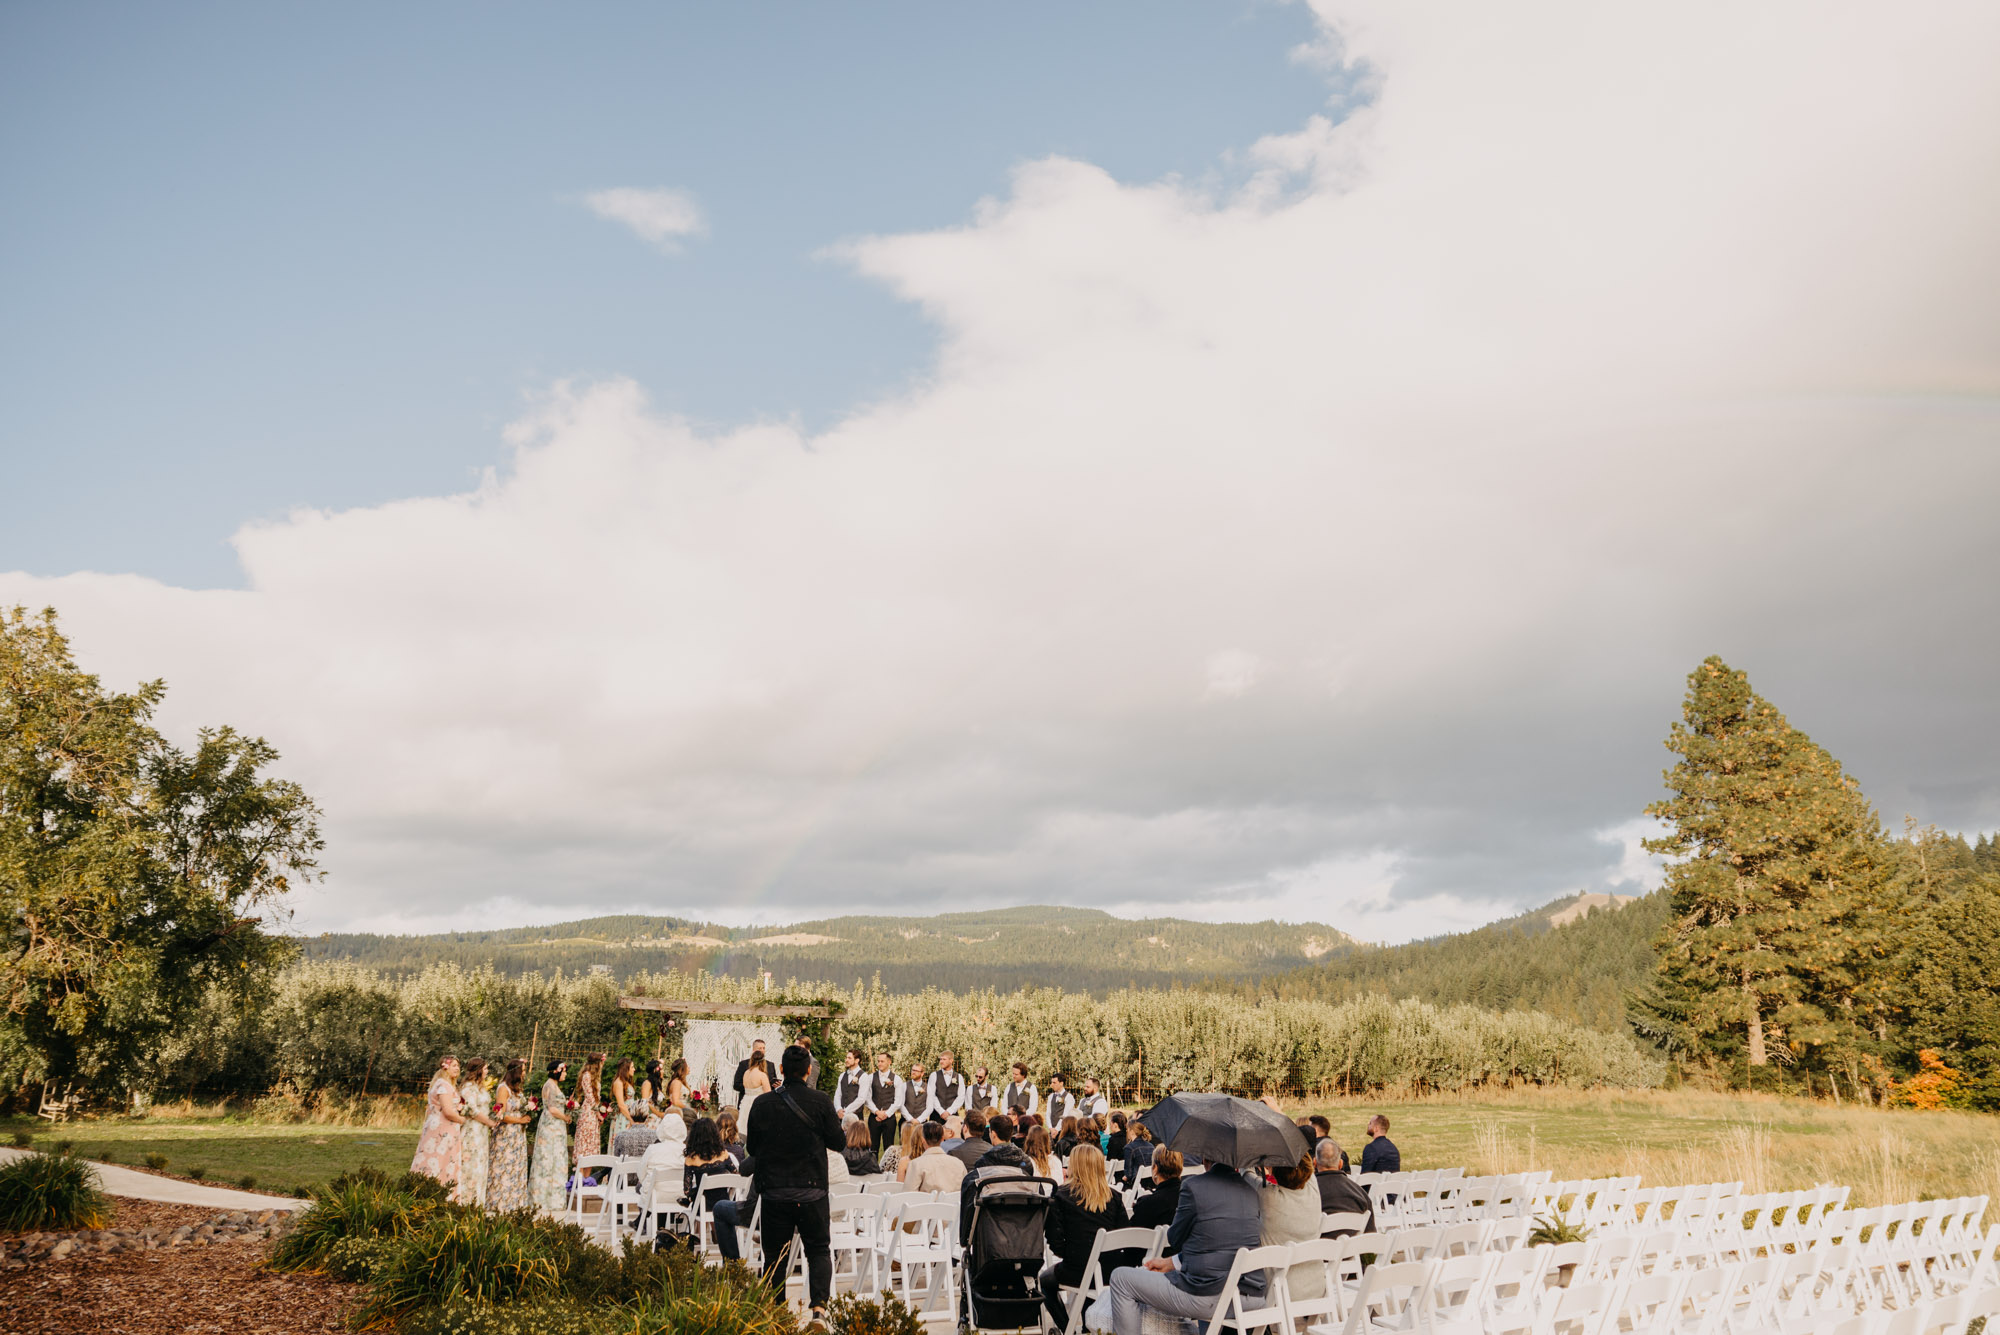 Outdoor-Summer-Ceremony-Washington-Wedding-Rainbow-5363.jpg